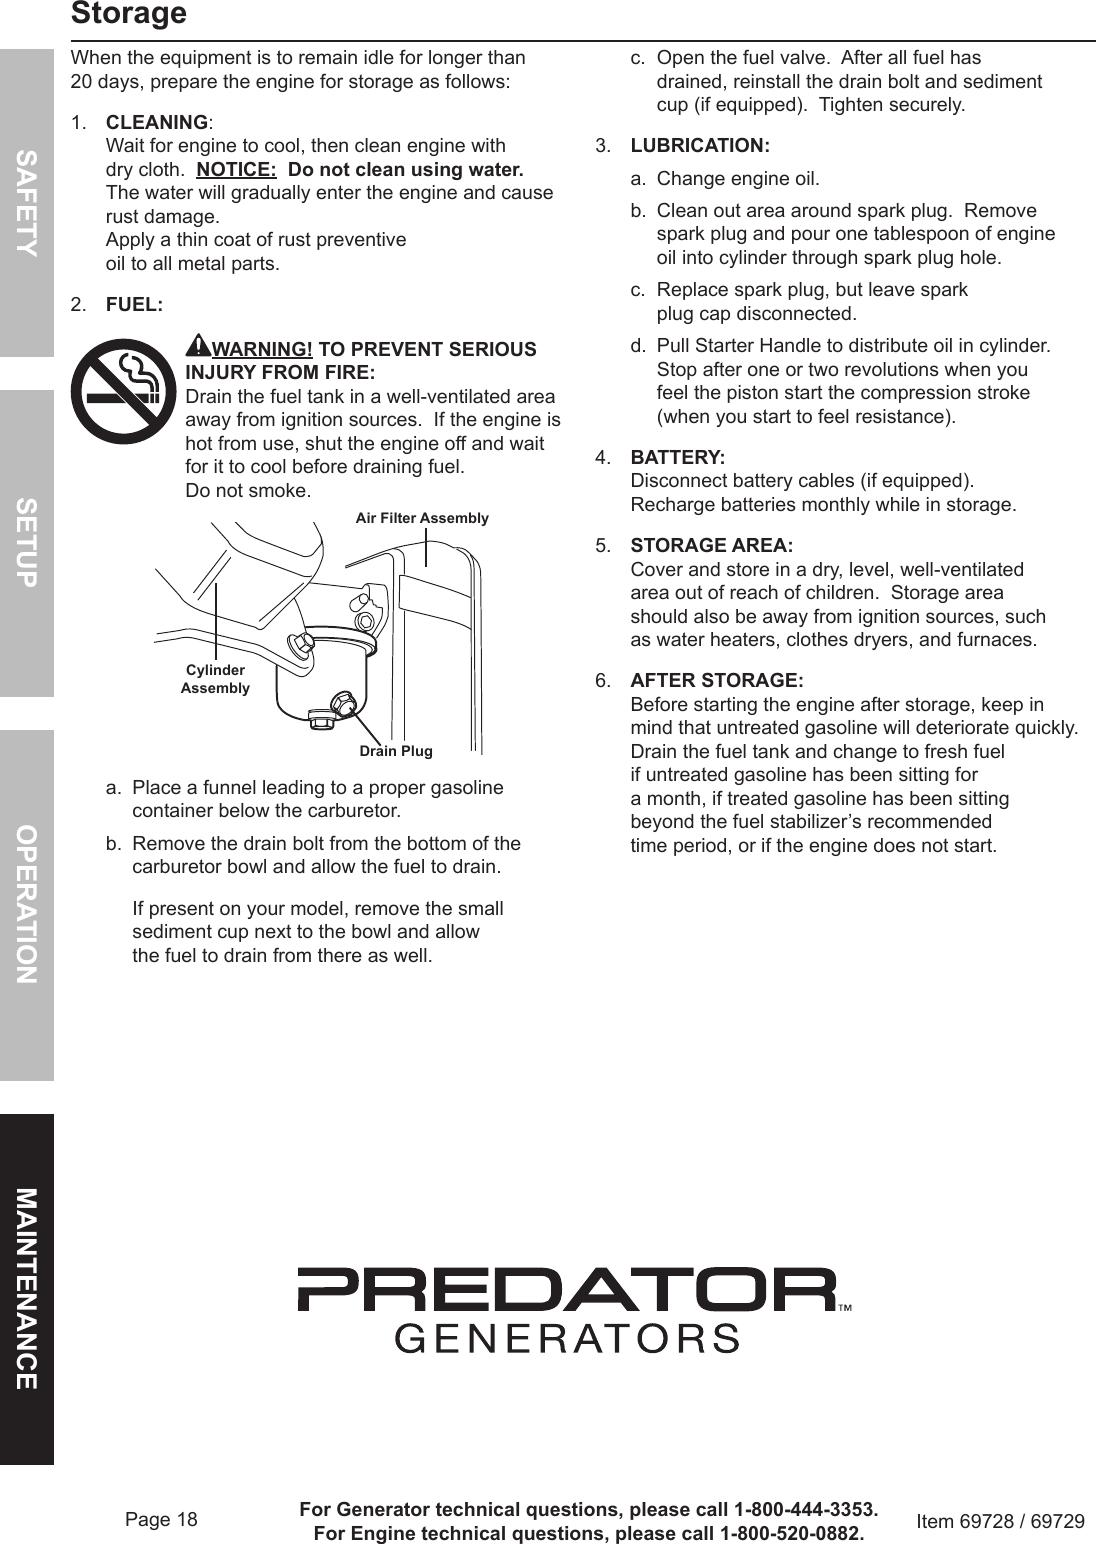 Harbor Freight Predator Generators 4000 Watt Portable Owners